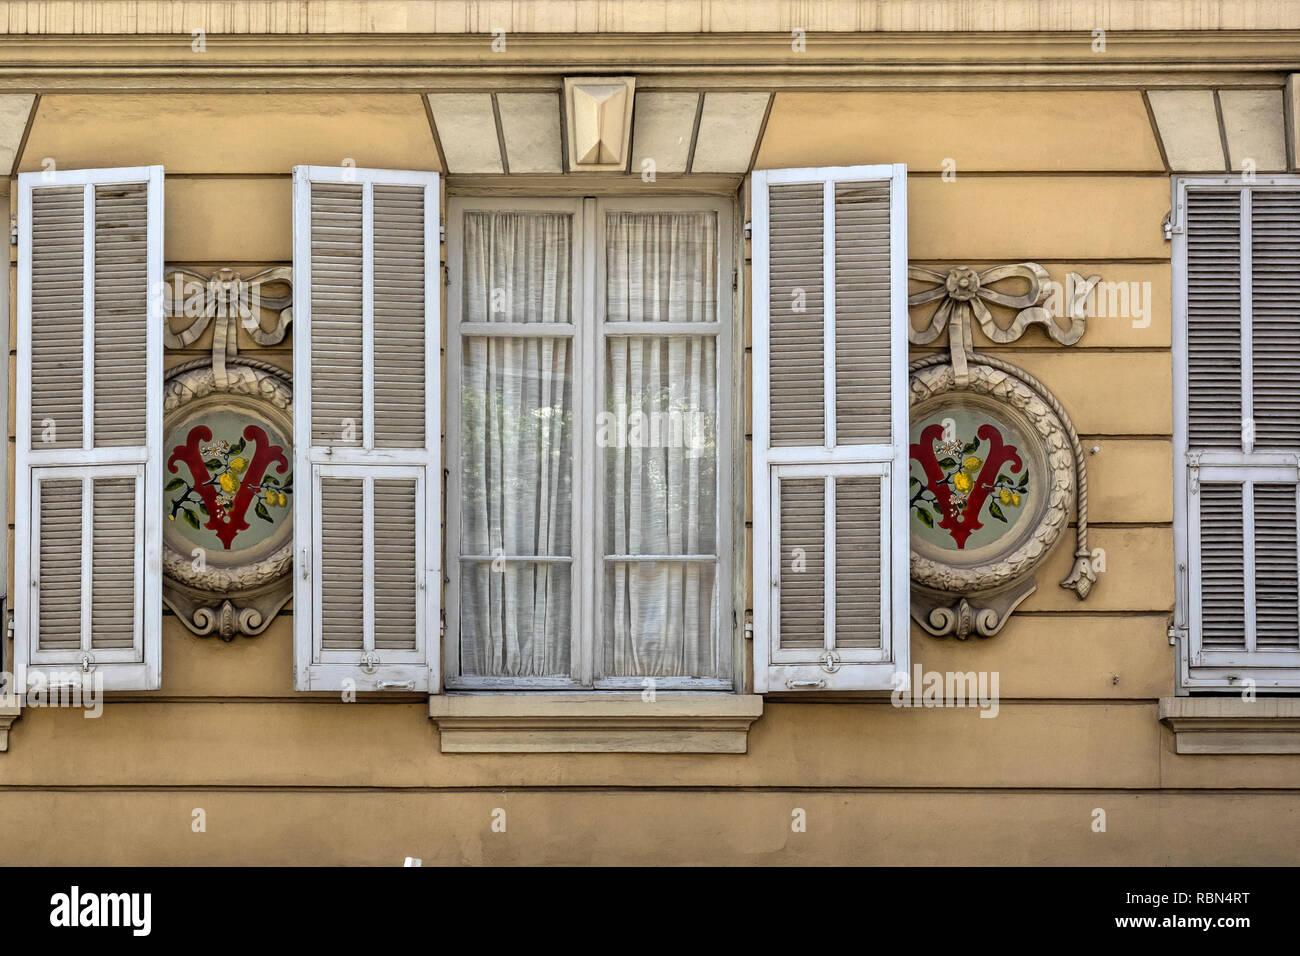 MONTE CARLO, MONACO:  Shuttered Windows on Apartment Building - Stock Image